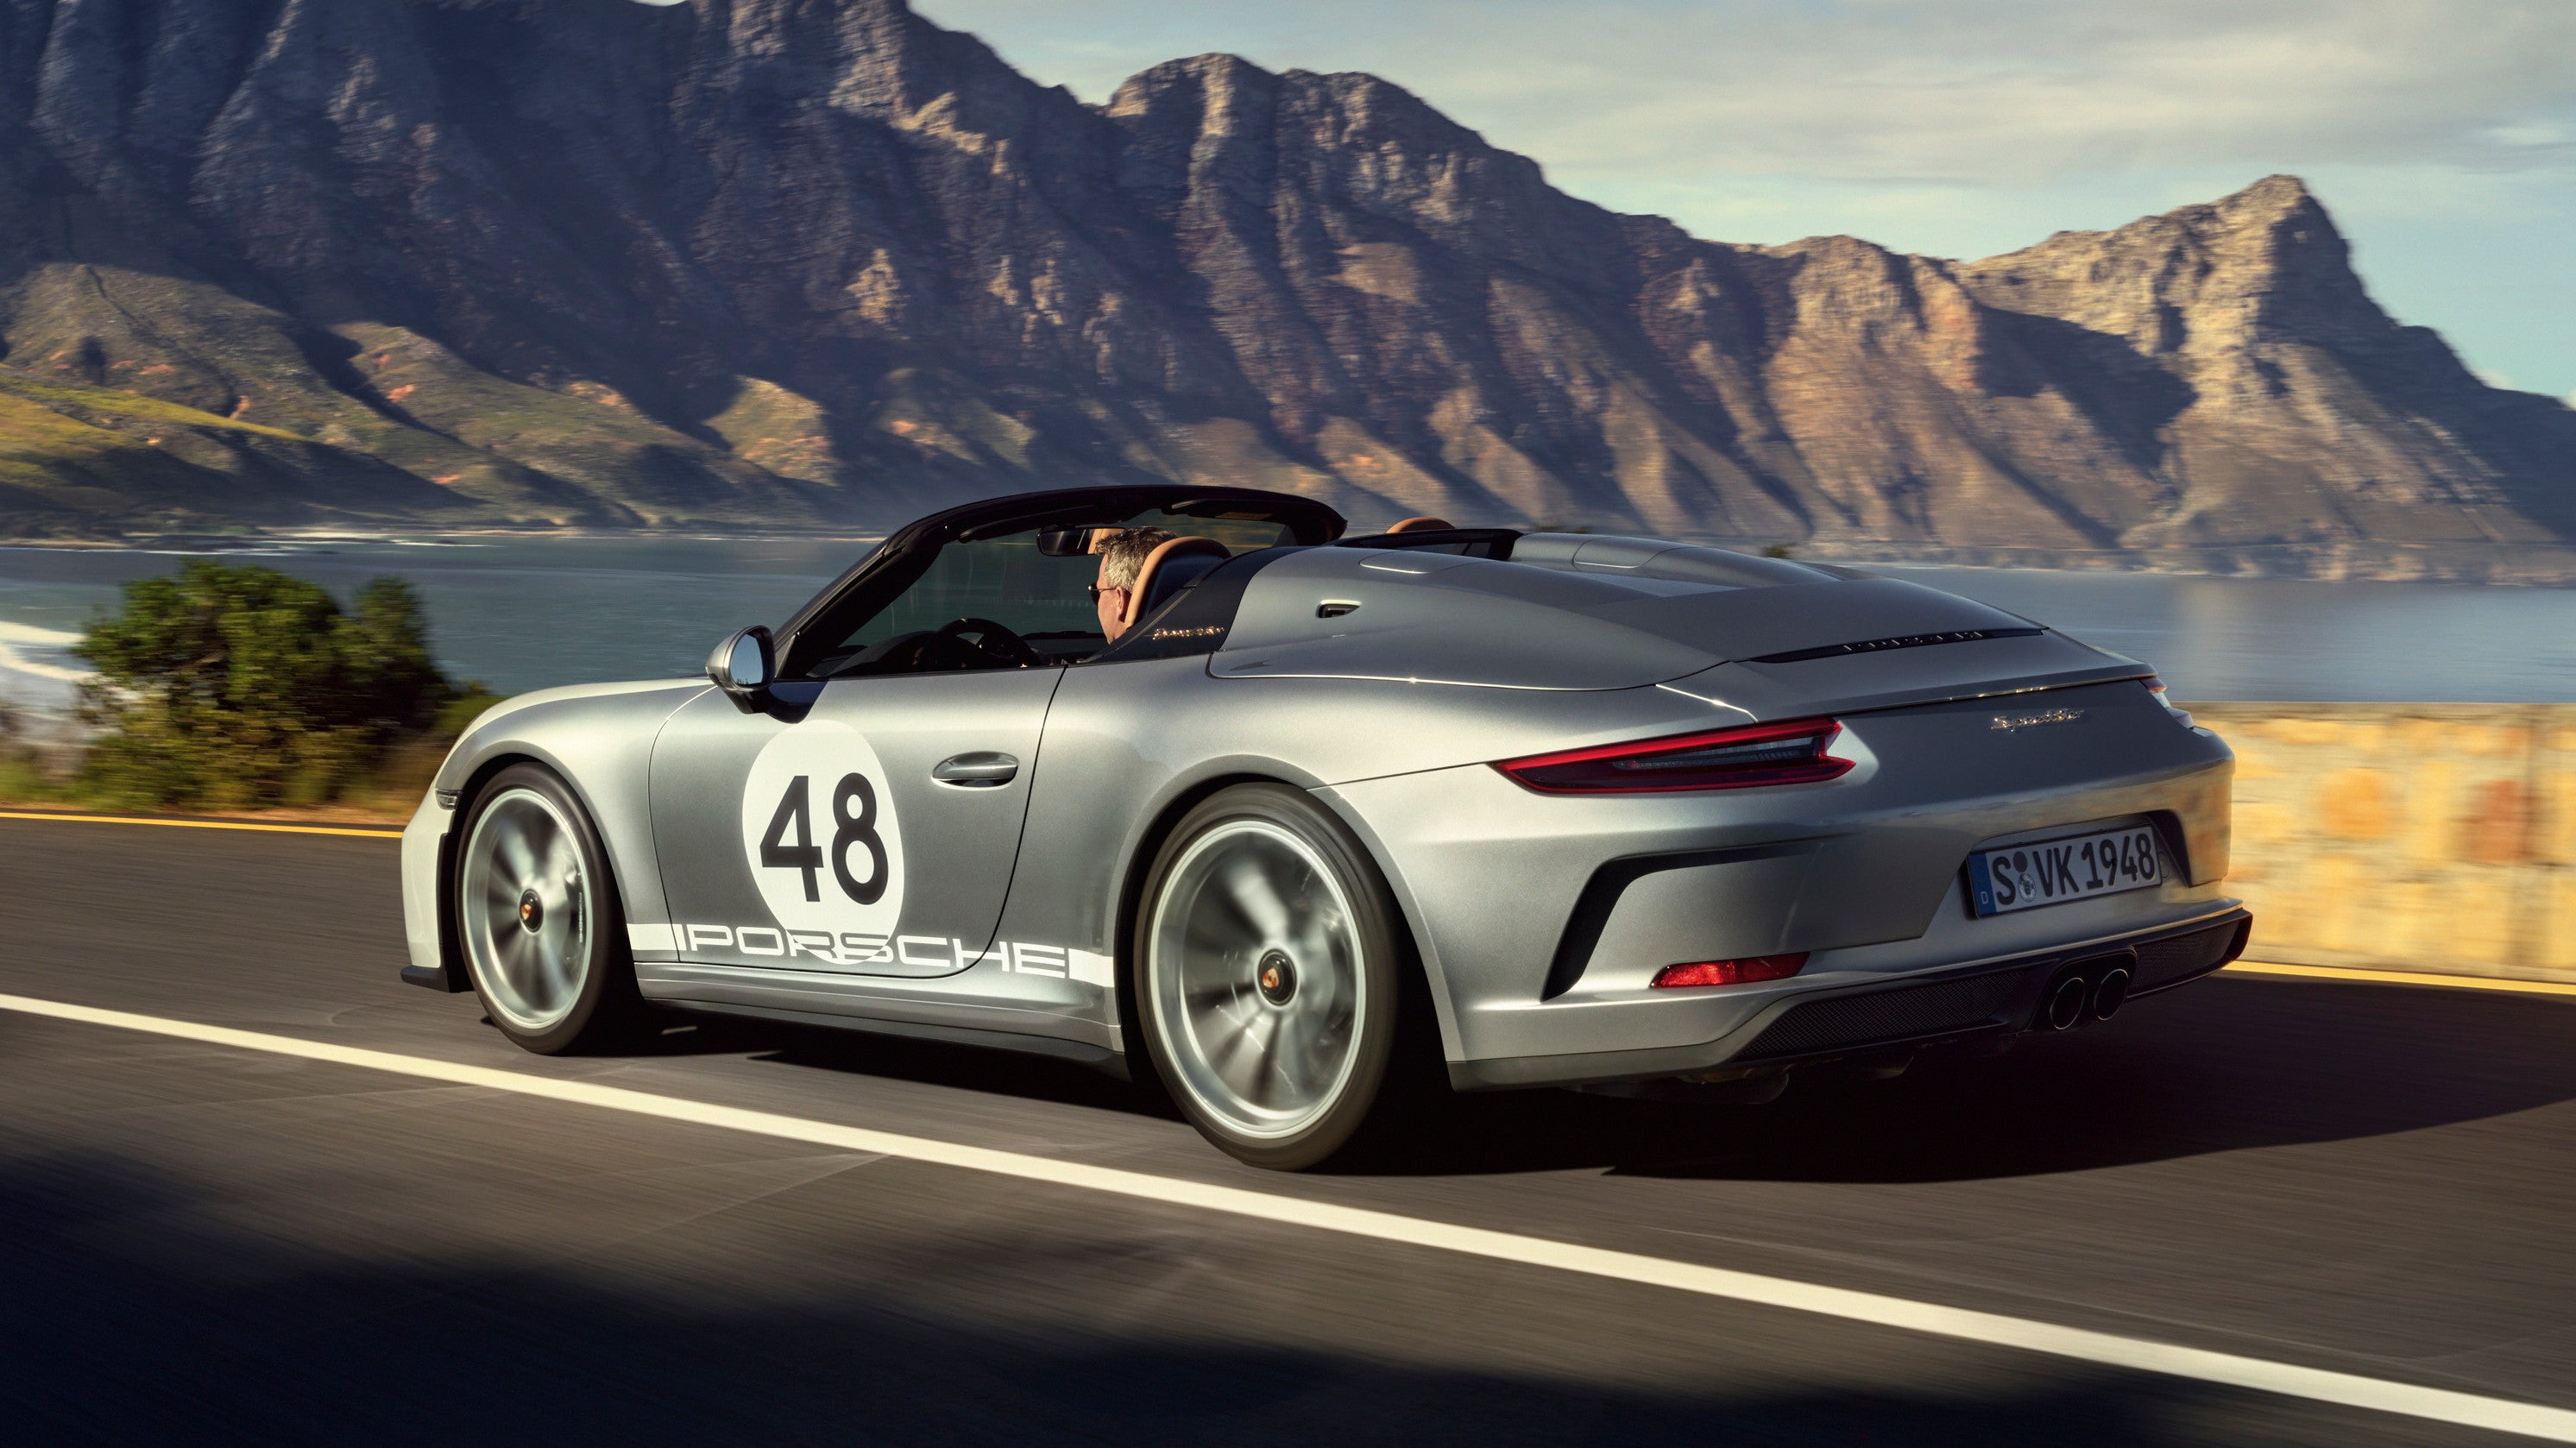 2015 - [Porsche] 911 Restylée [991] - Page 13 F1cvv9j9wypfeu8rz2iy